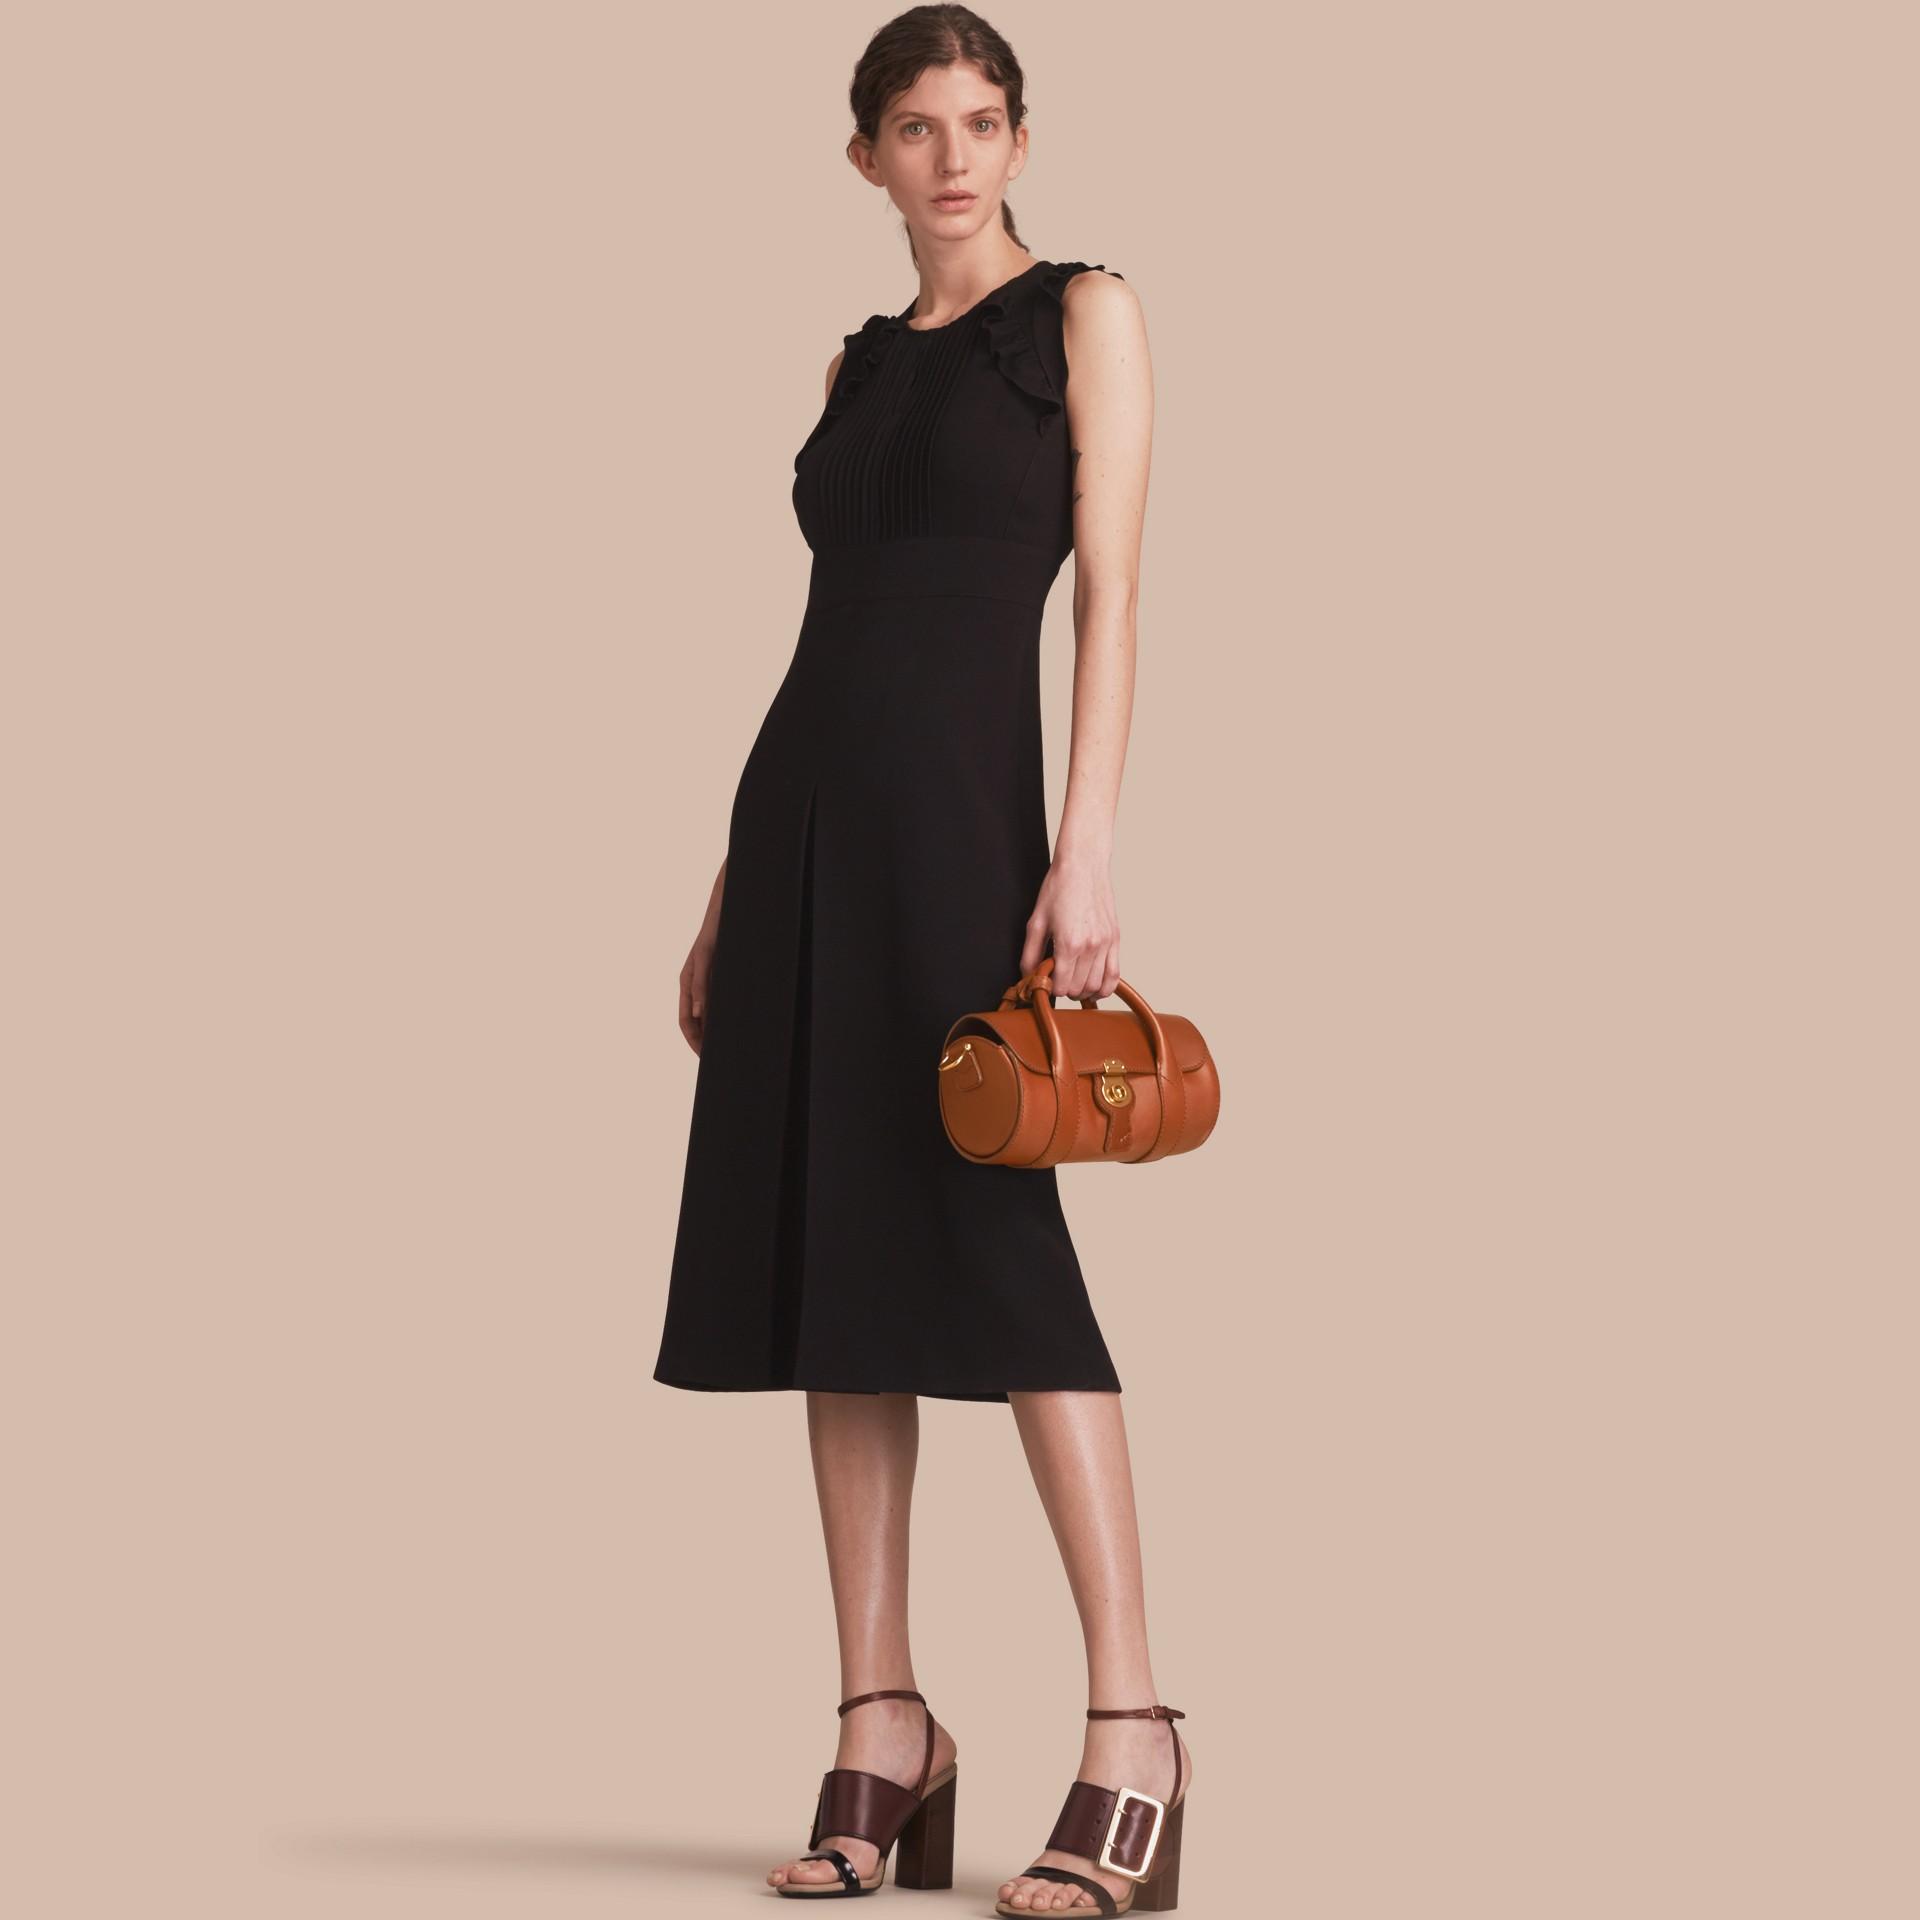 Sleeveless Ruffle Trim Crepe Dress - gallery image 1